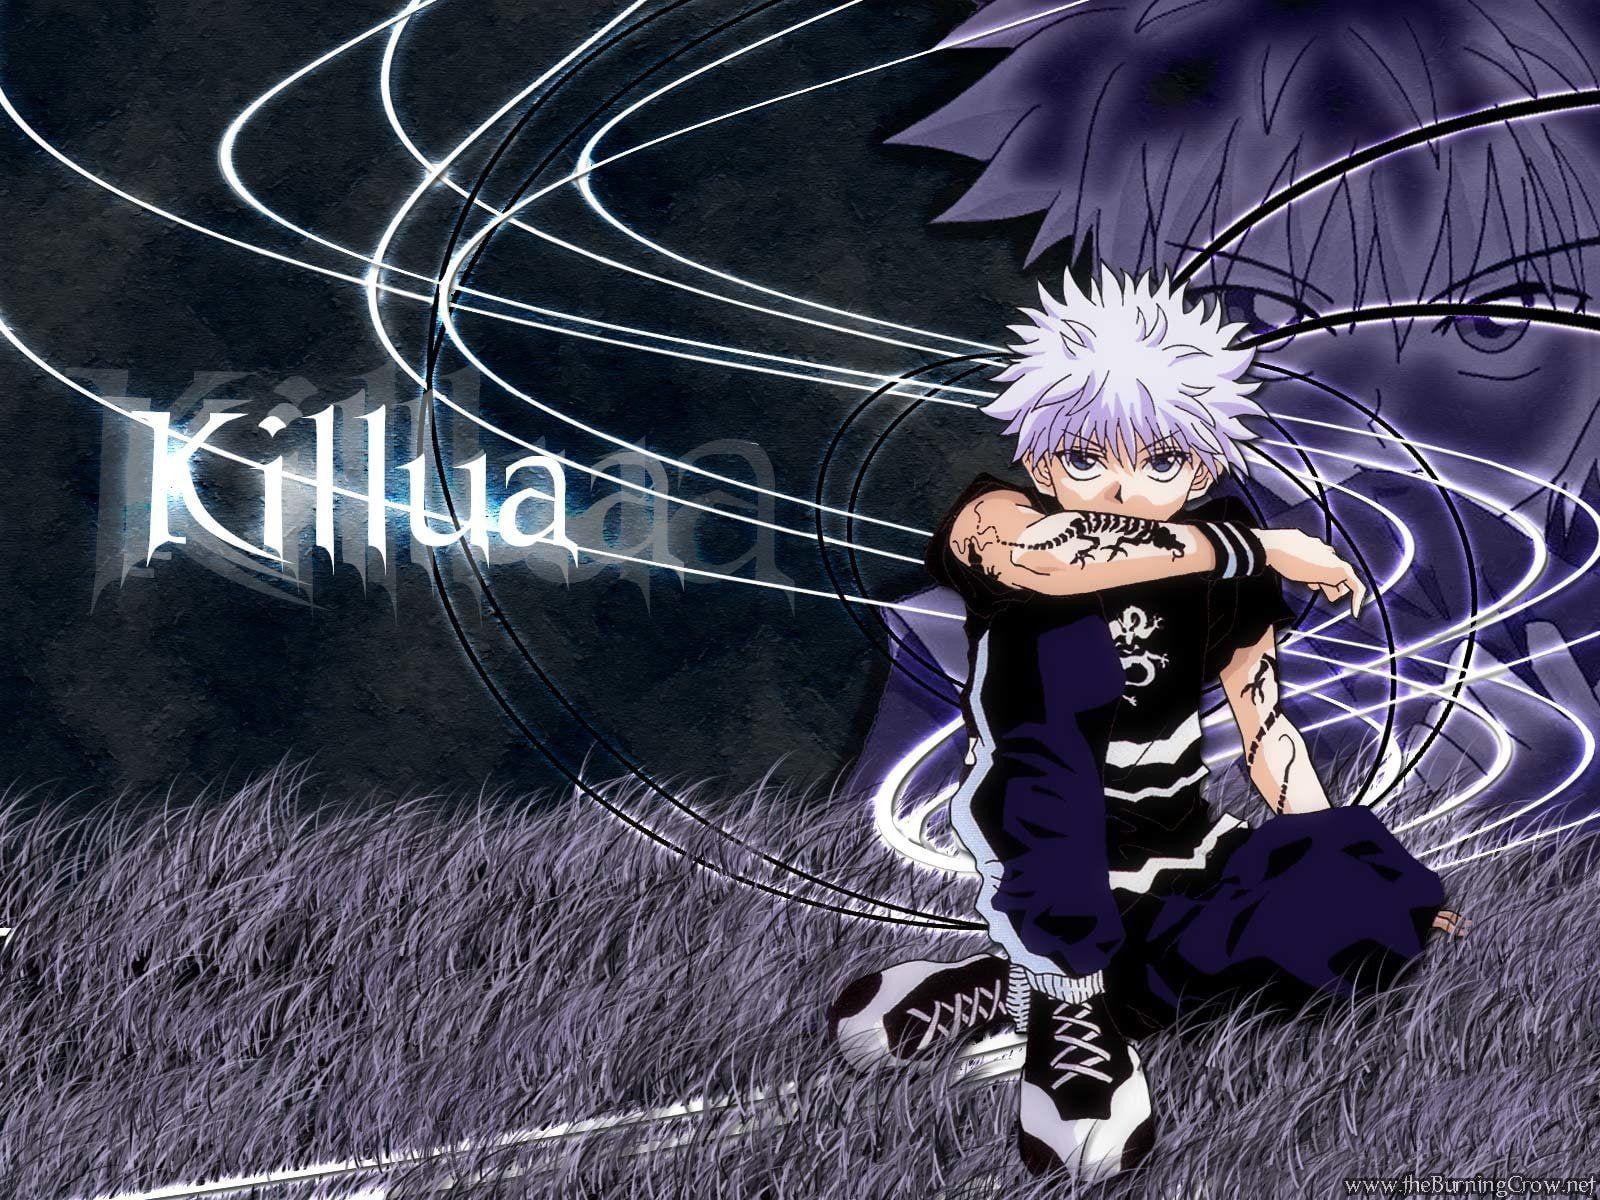 Killua Hd Wallpaper Anime Hunter X Hunter Killua Zoldyck 720p Wallpaper Hdwallpaper Desktop Anime Wallpaper Anime Anime Images Anime wallpaper hd killua